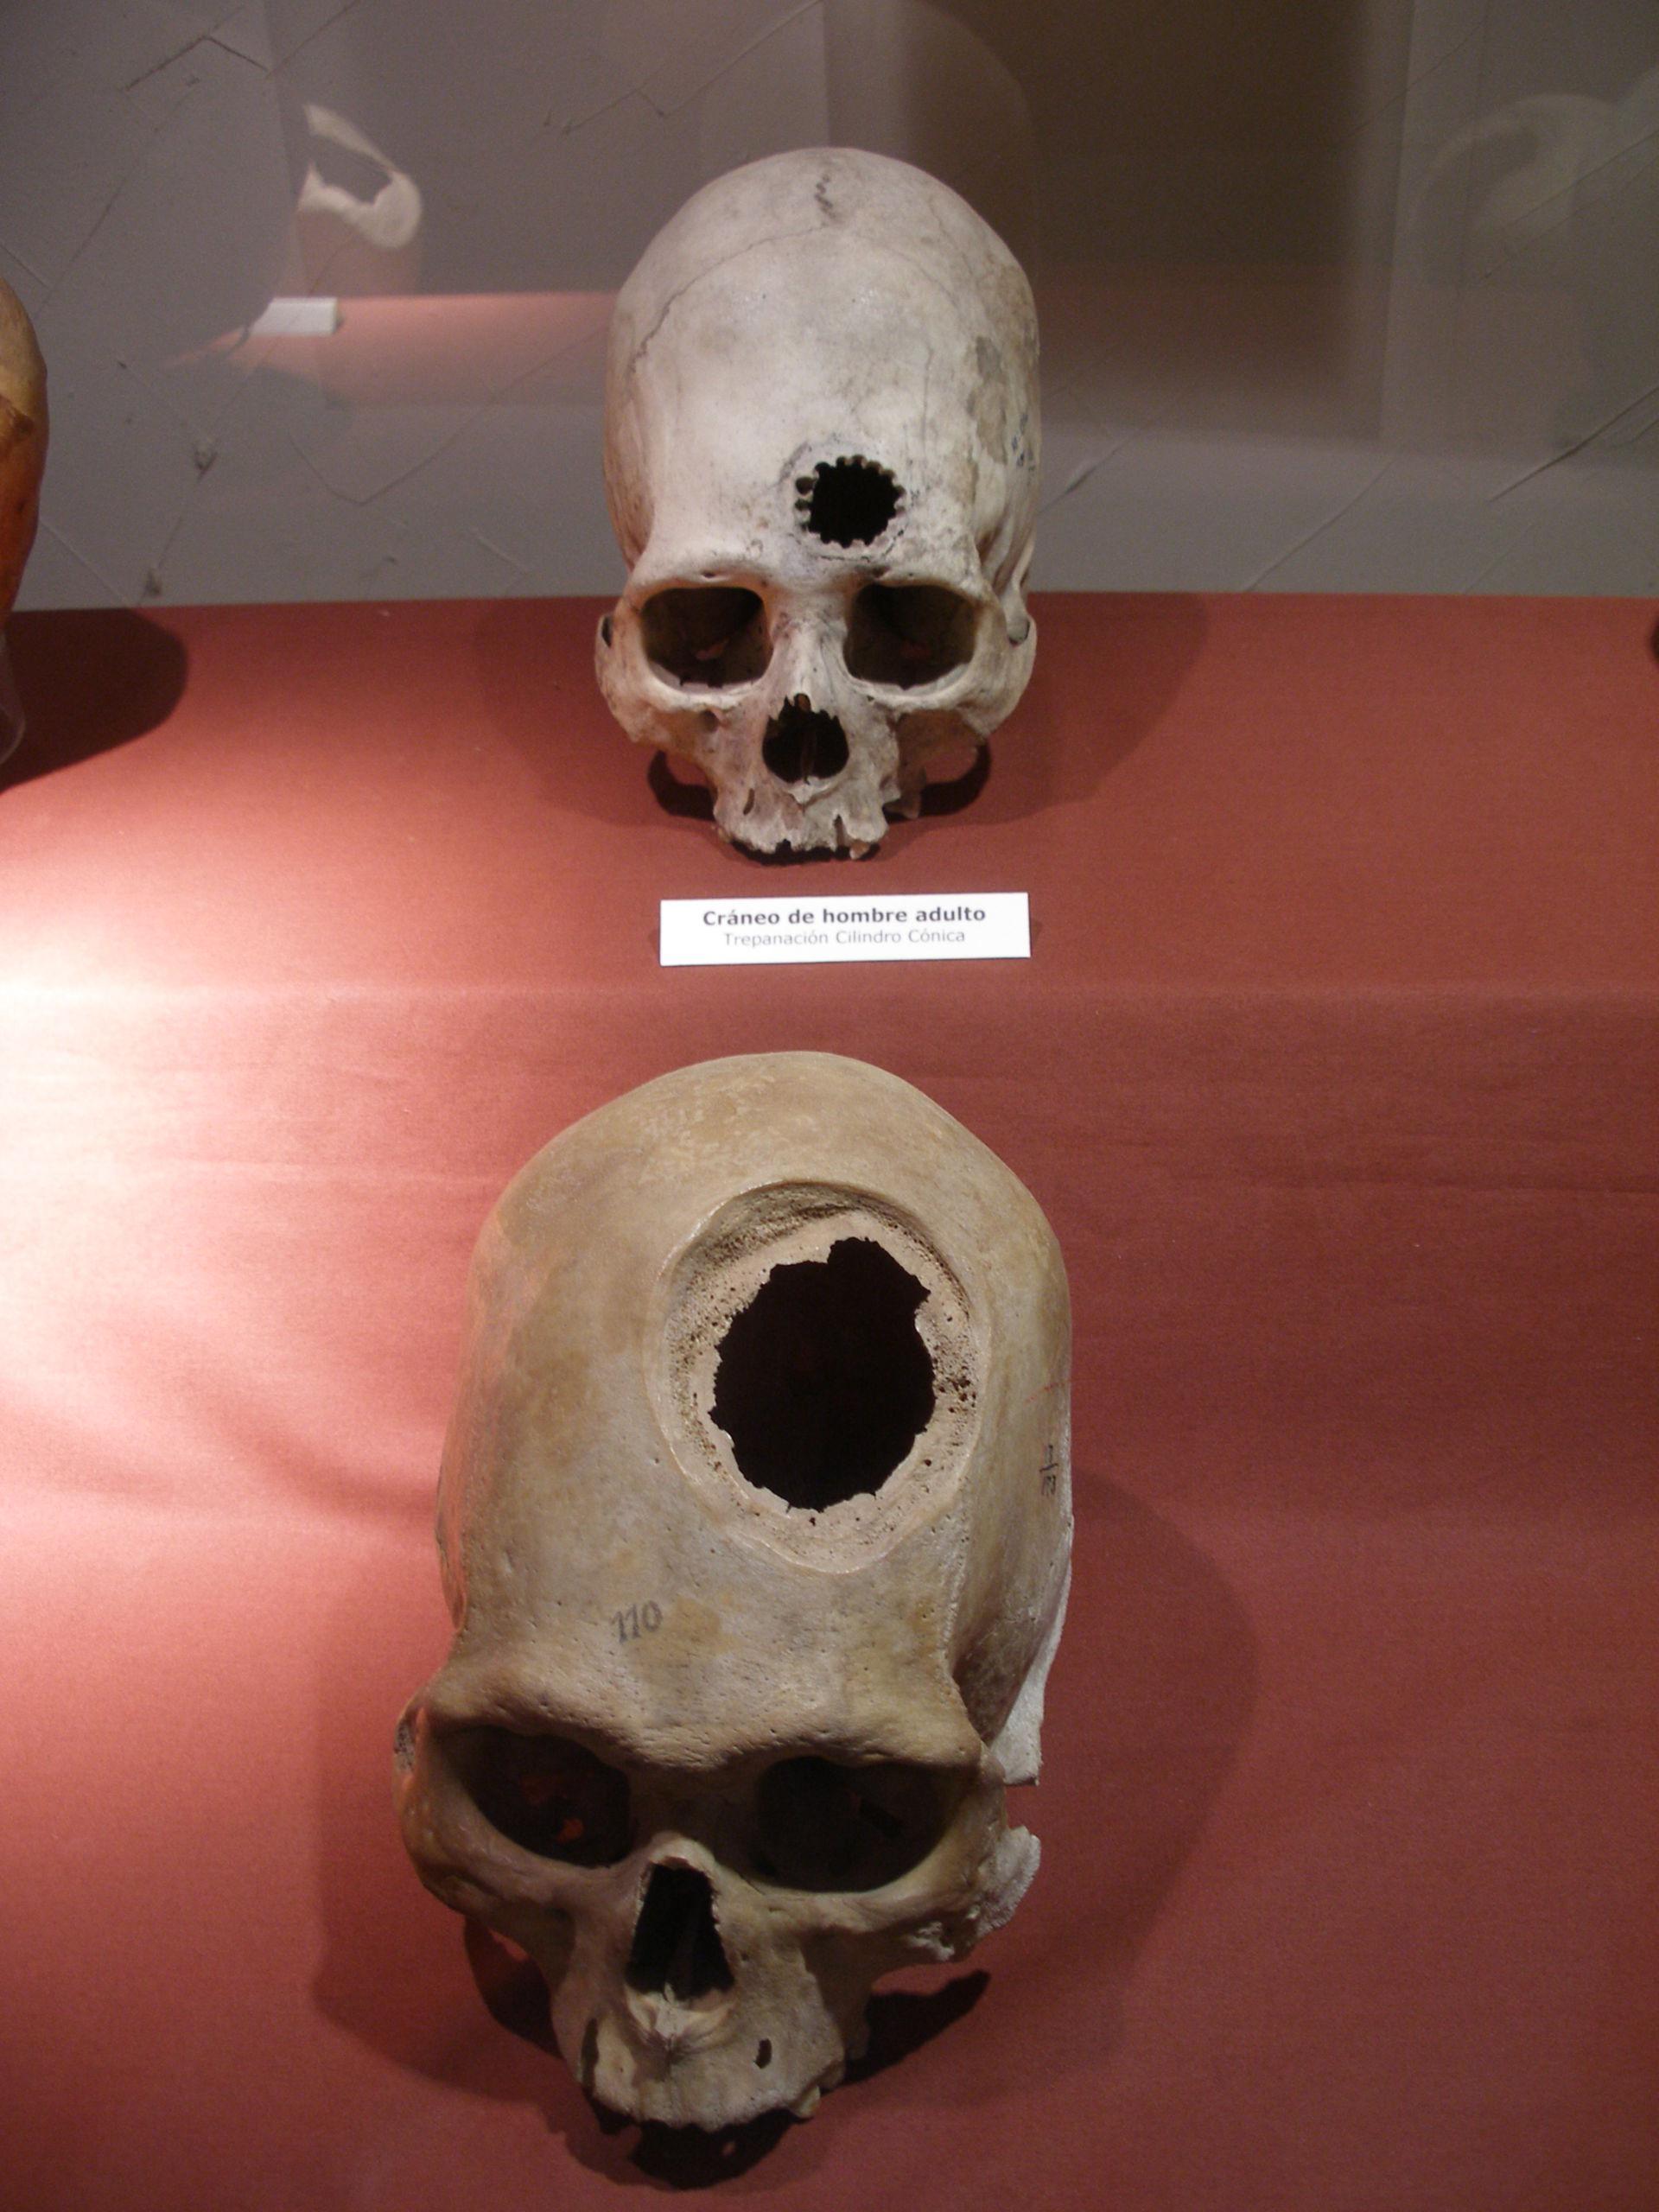 Brain surgery by Incans